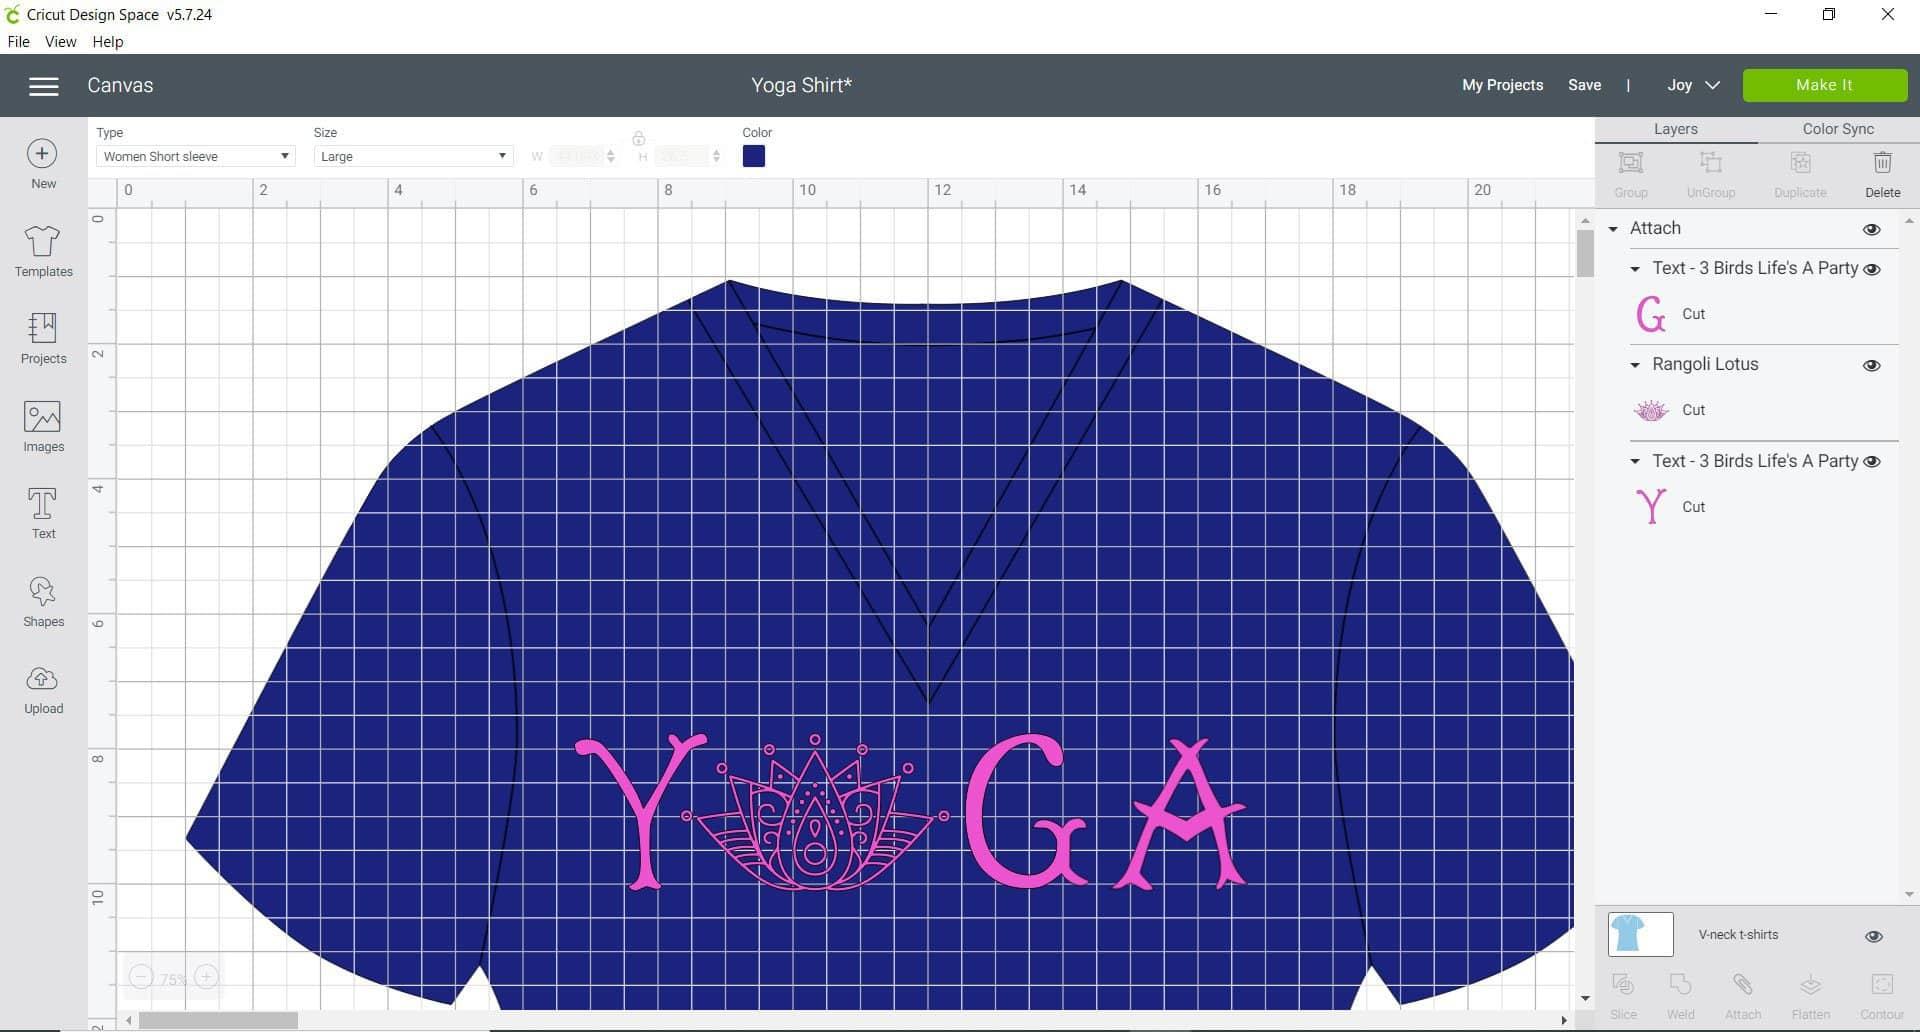 cricut design space - yoga shirt